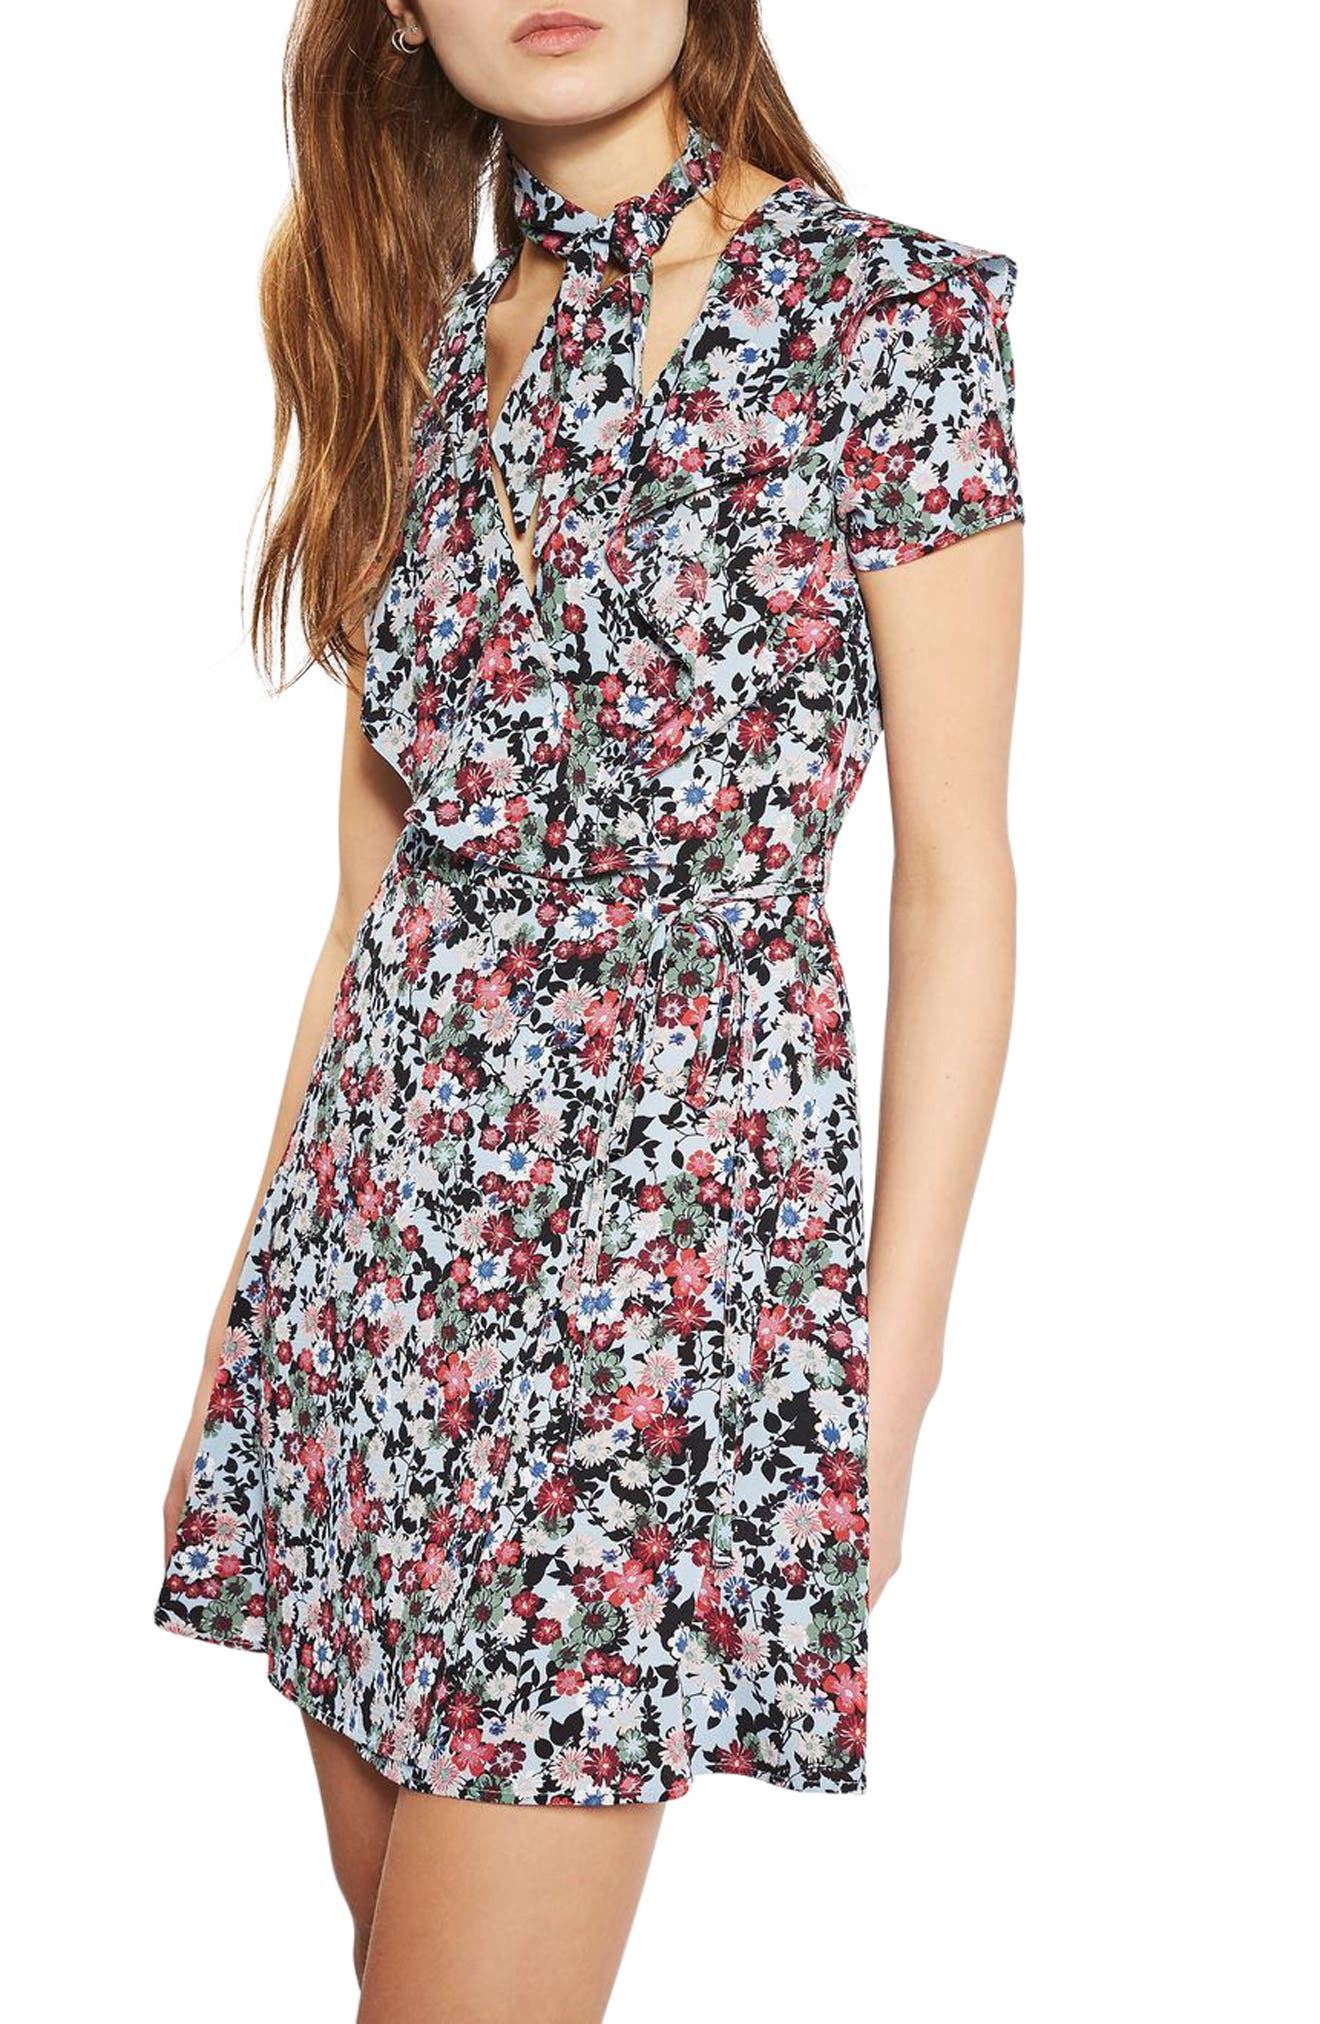 Alternate Image 1 Selected - Topshop Sky Floral Wrap Dress